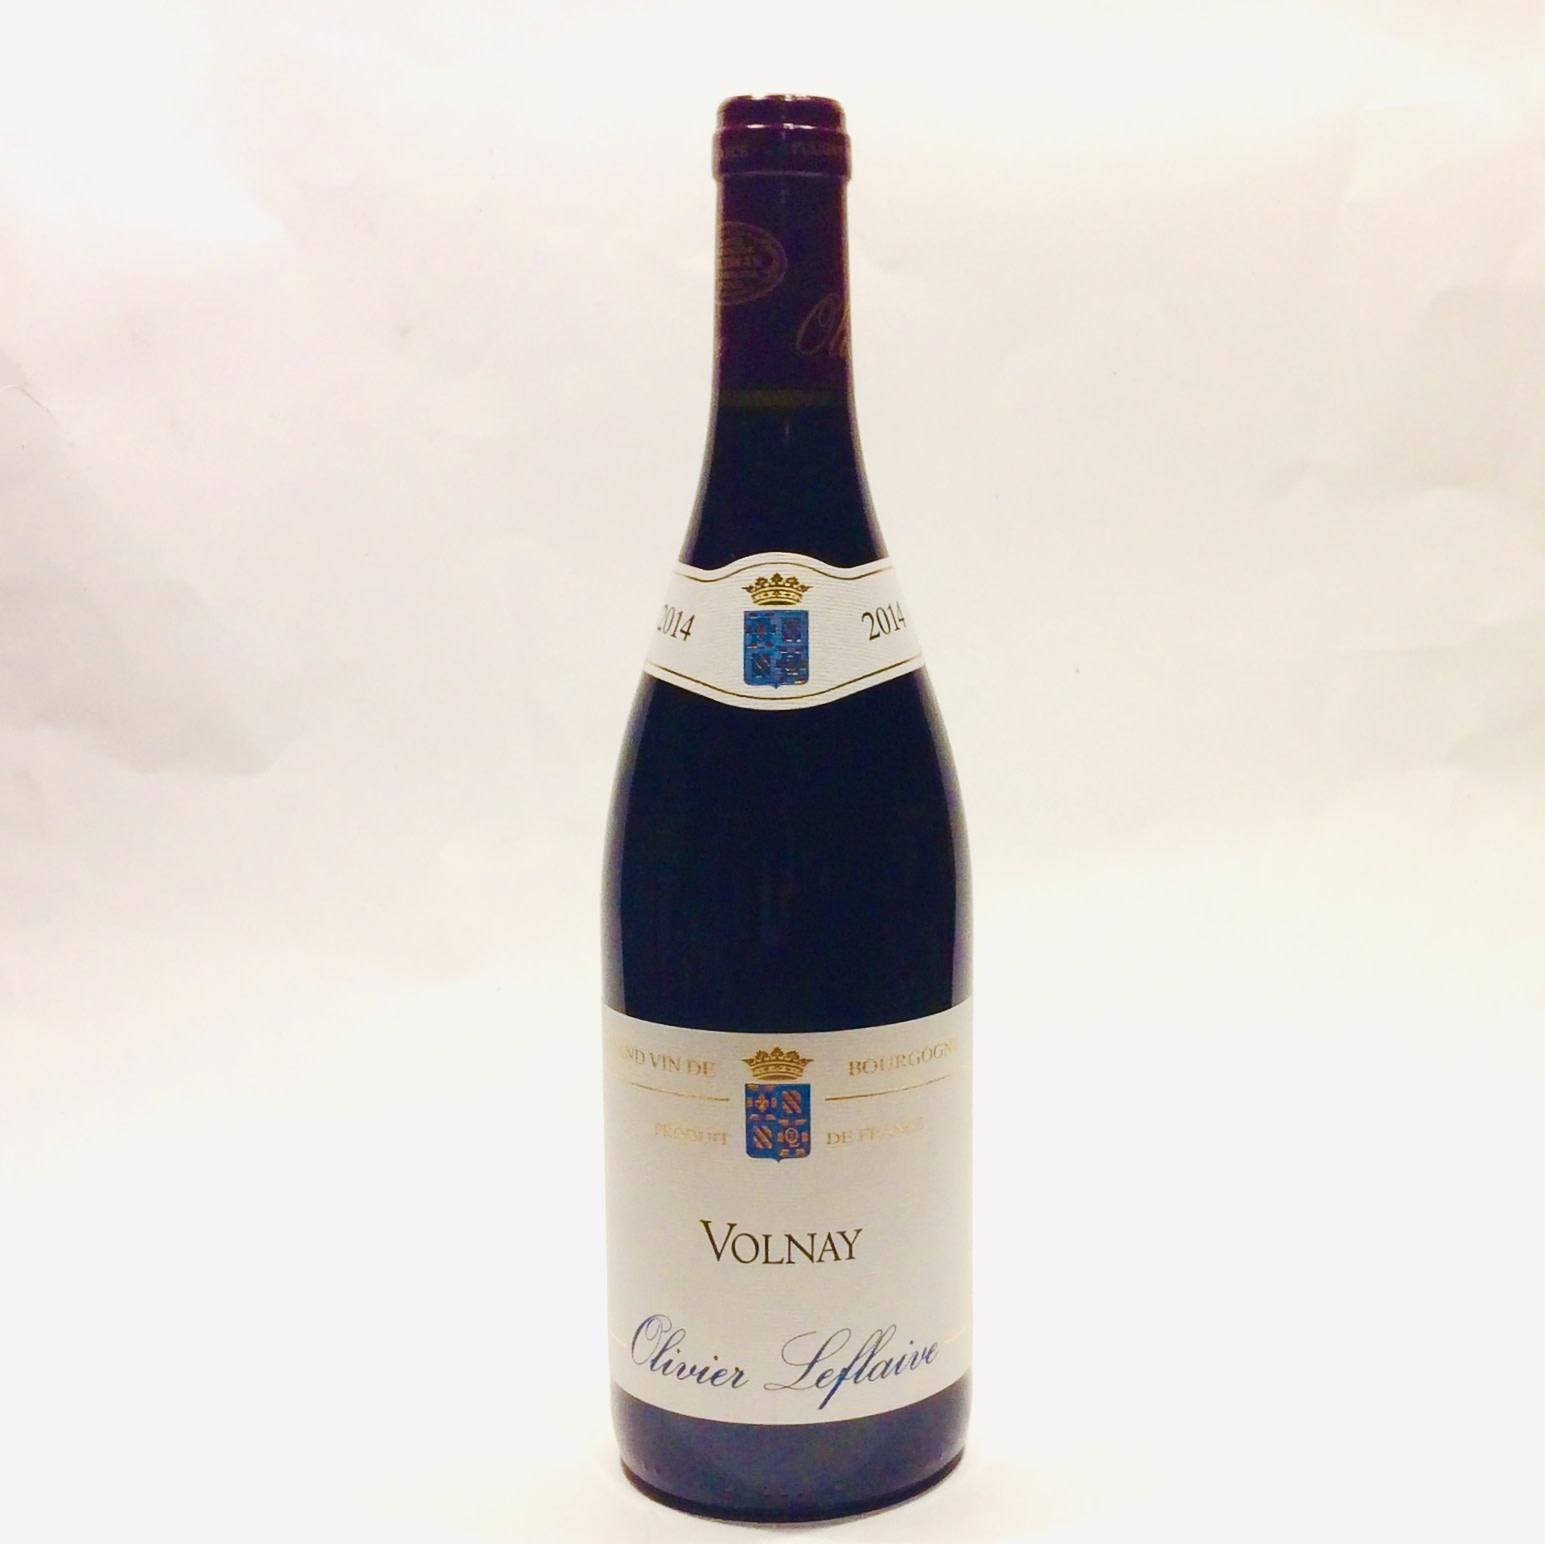 Volnay - Olivier Leflaive - Grand Vin 2014 (750 ml)